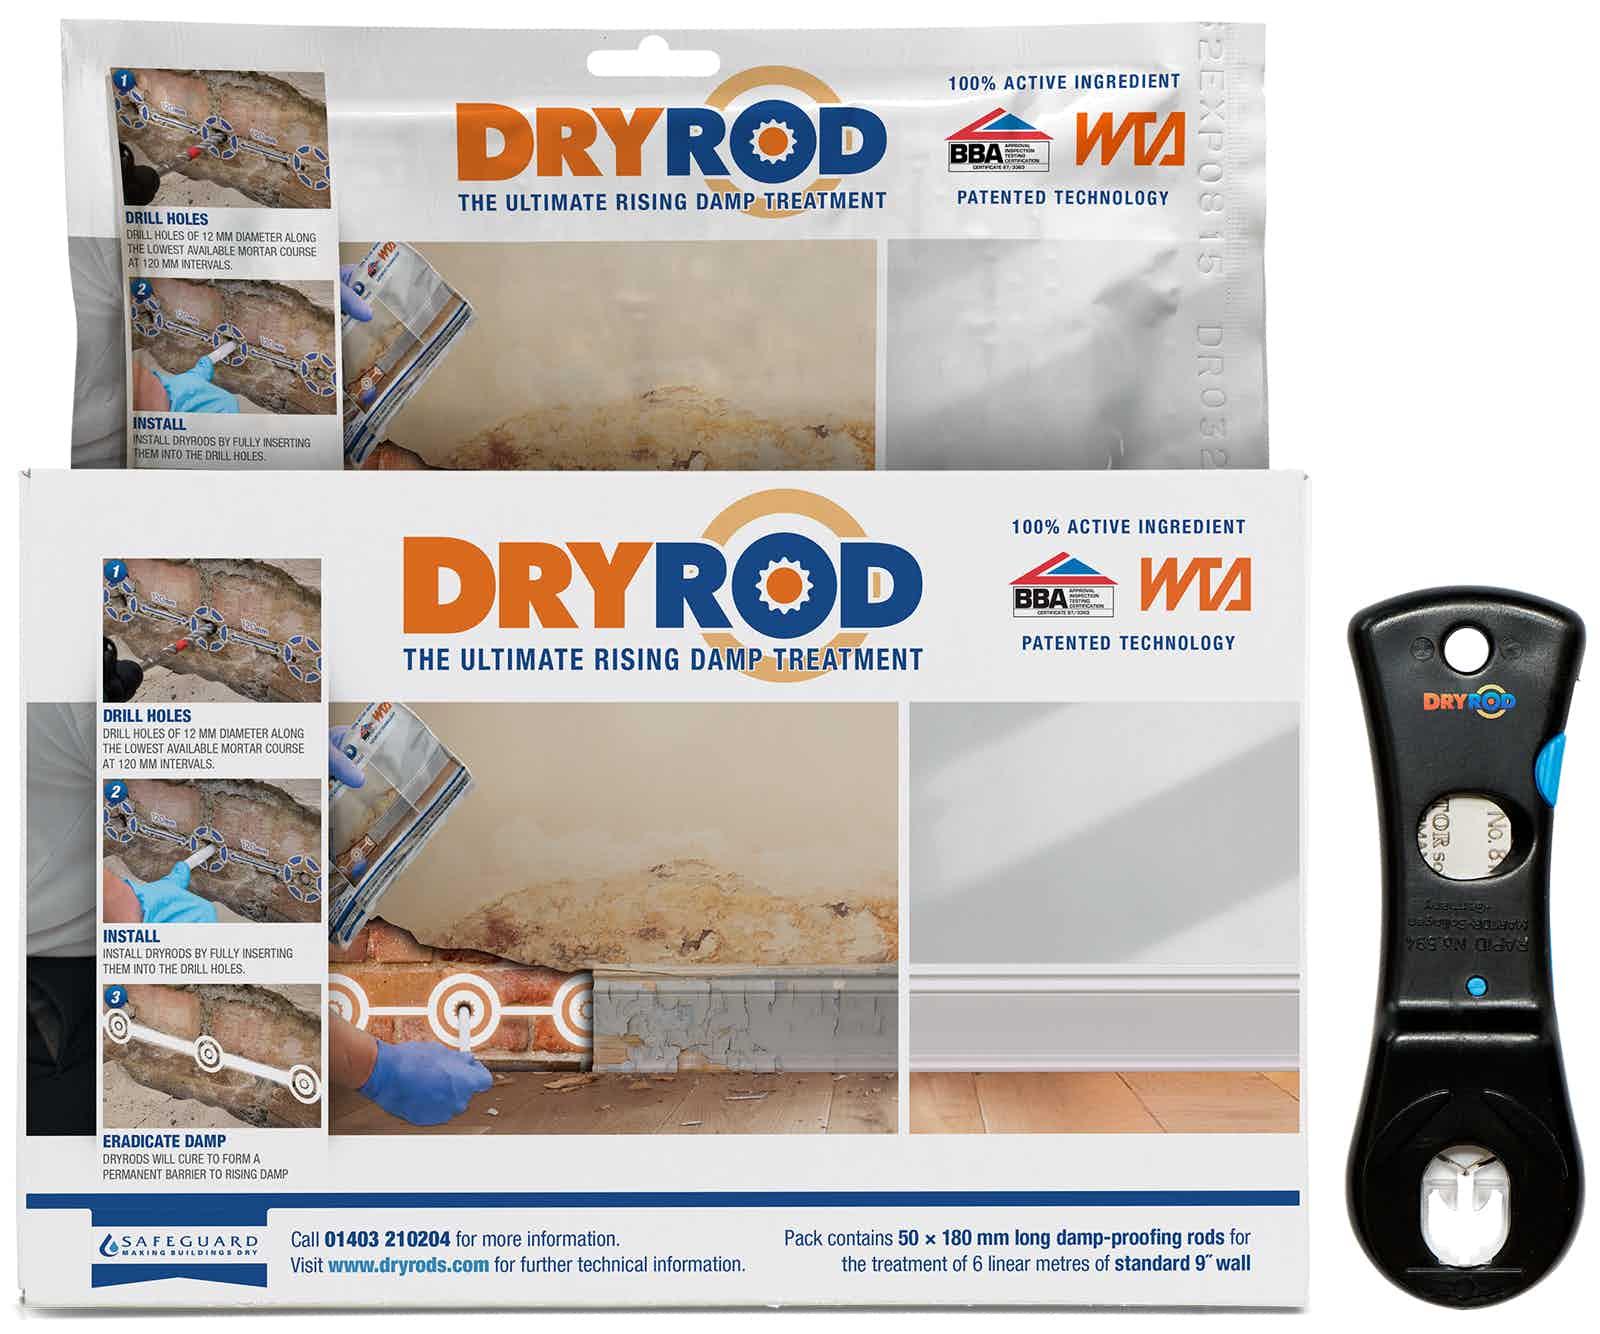 Dryrod Damp-Proofing Rods